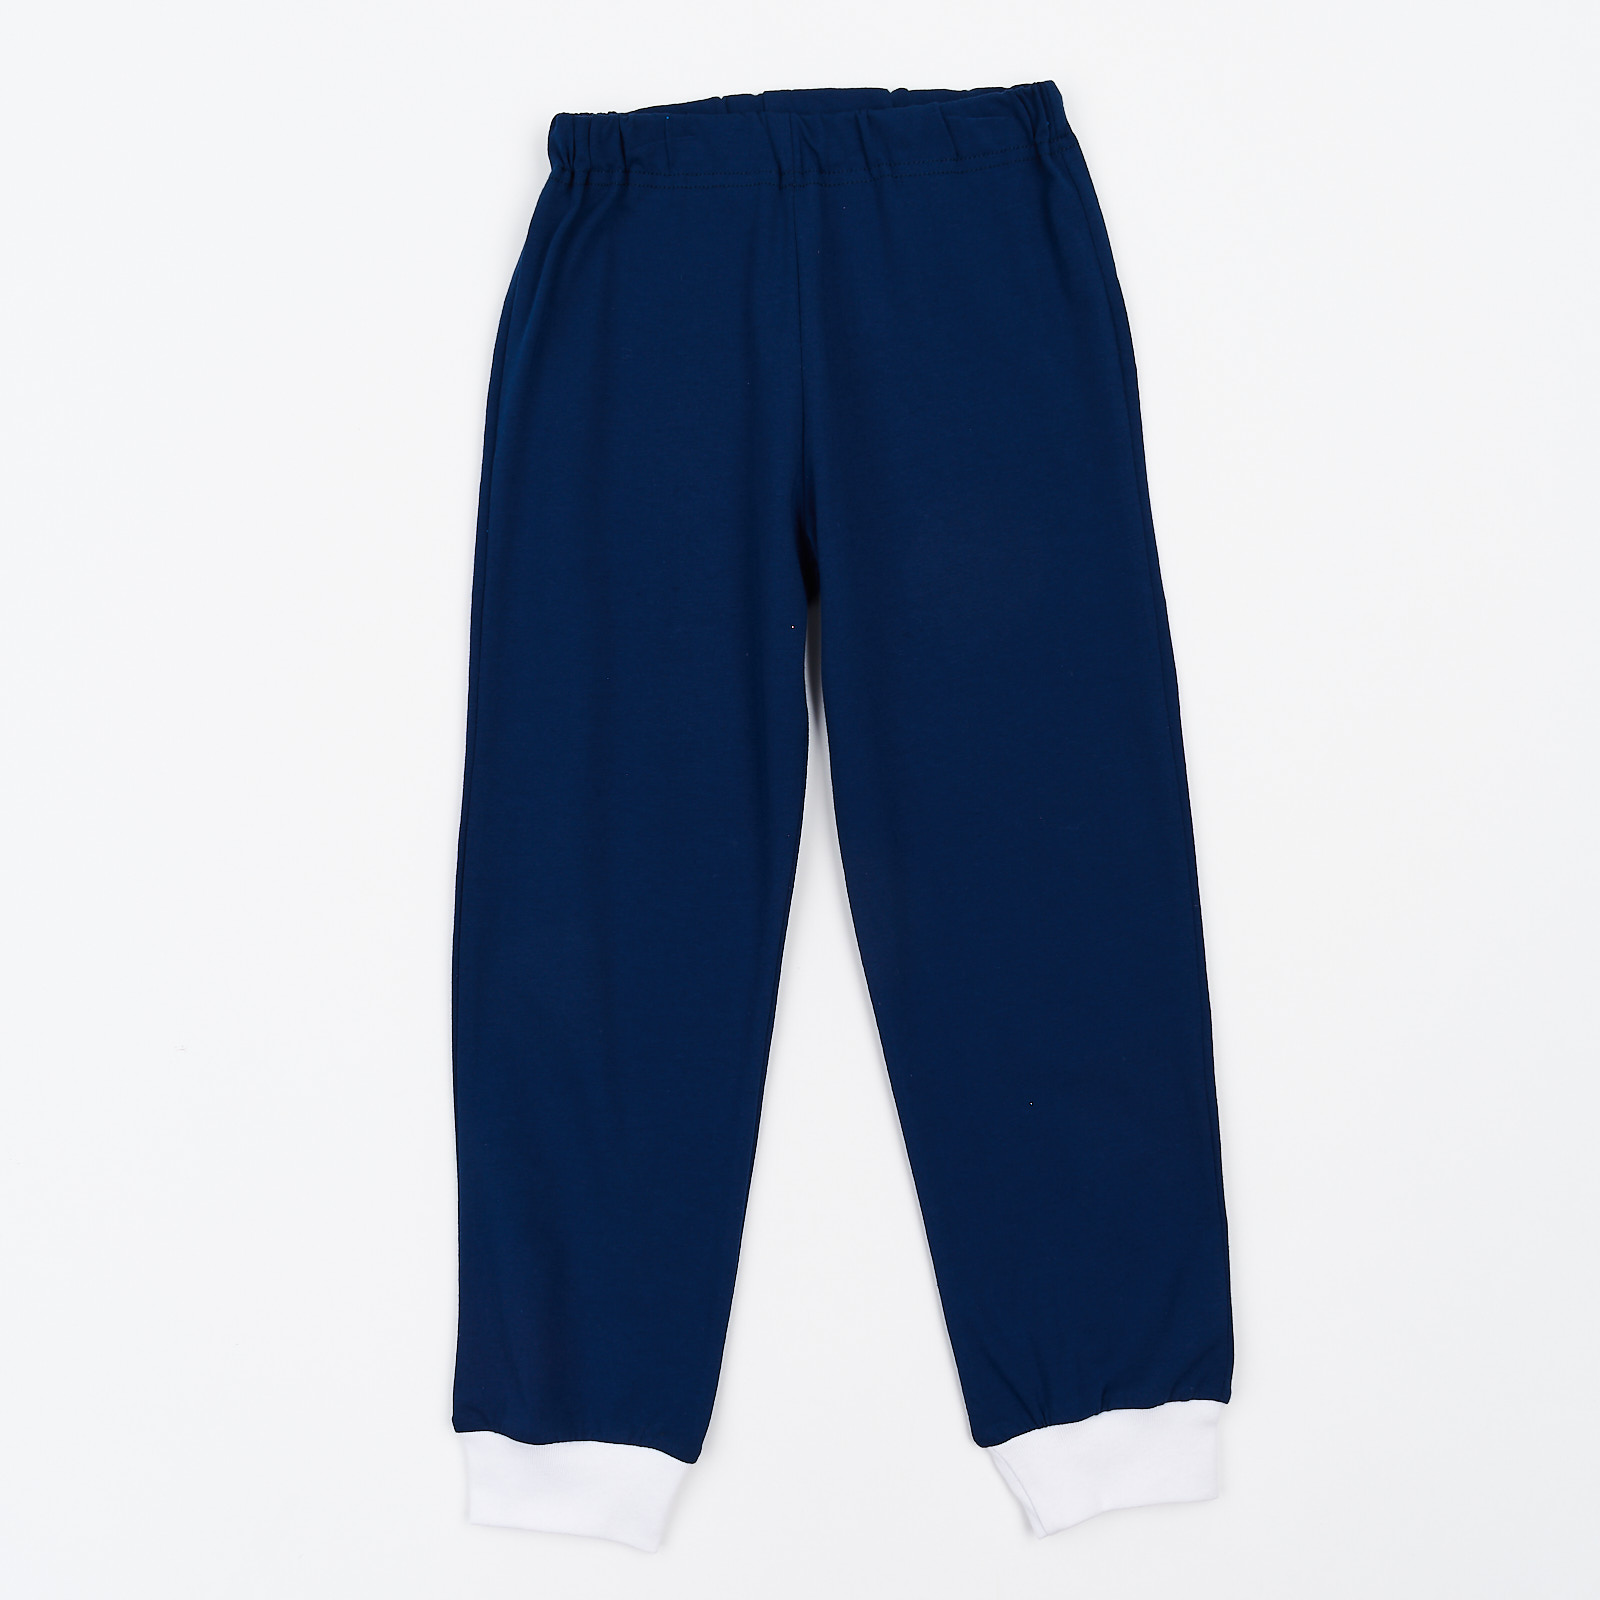 Пижама детские Garnamama модель 2EI~99377-1 цена, 2017